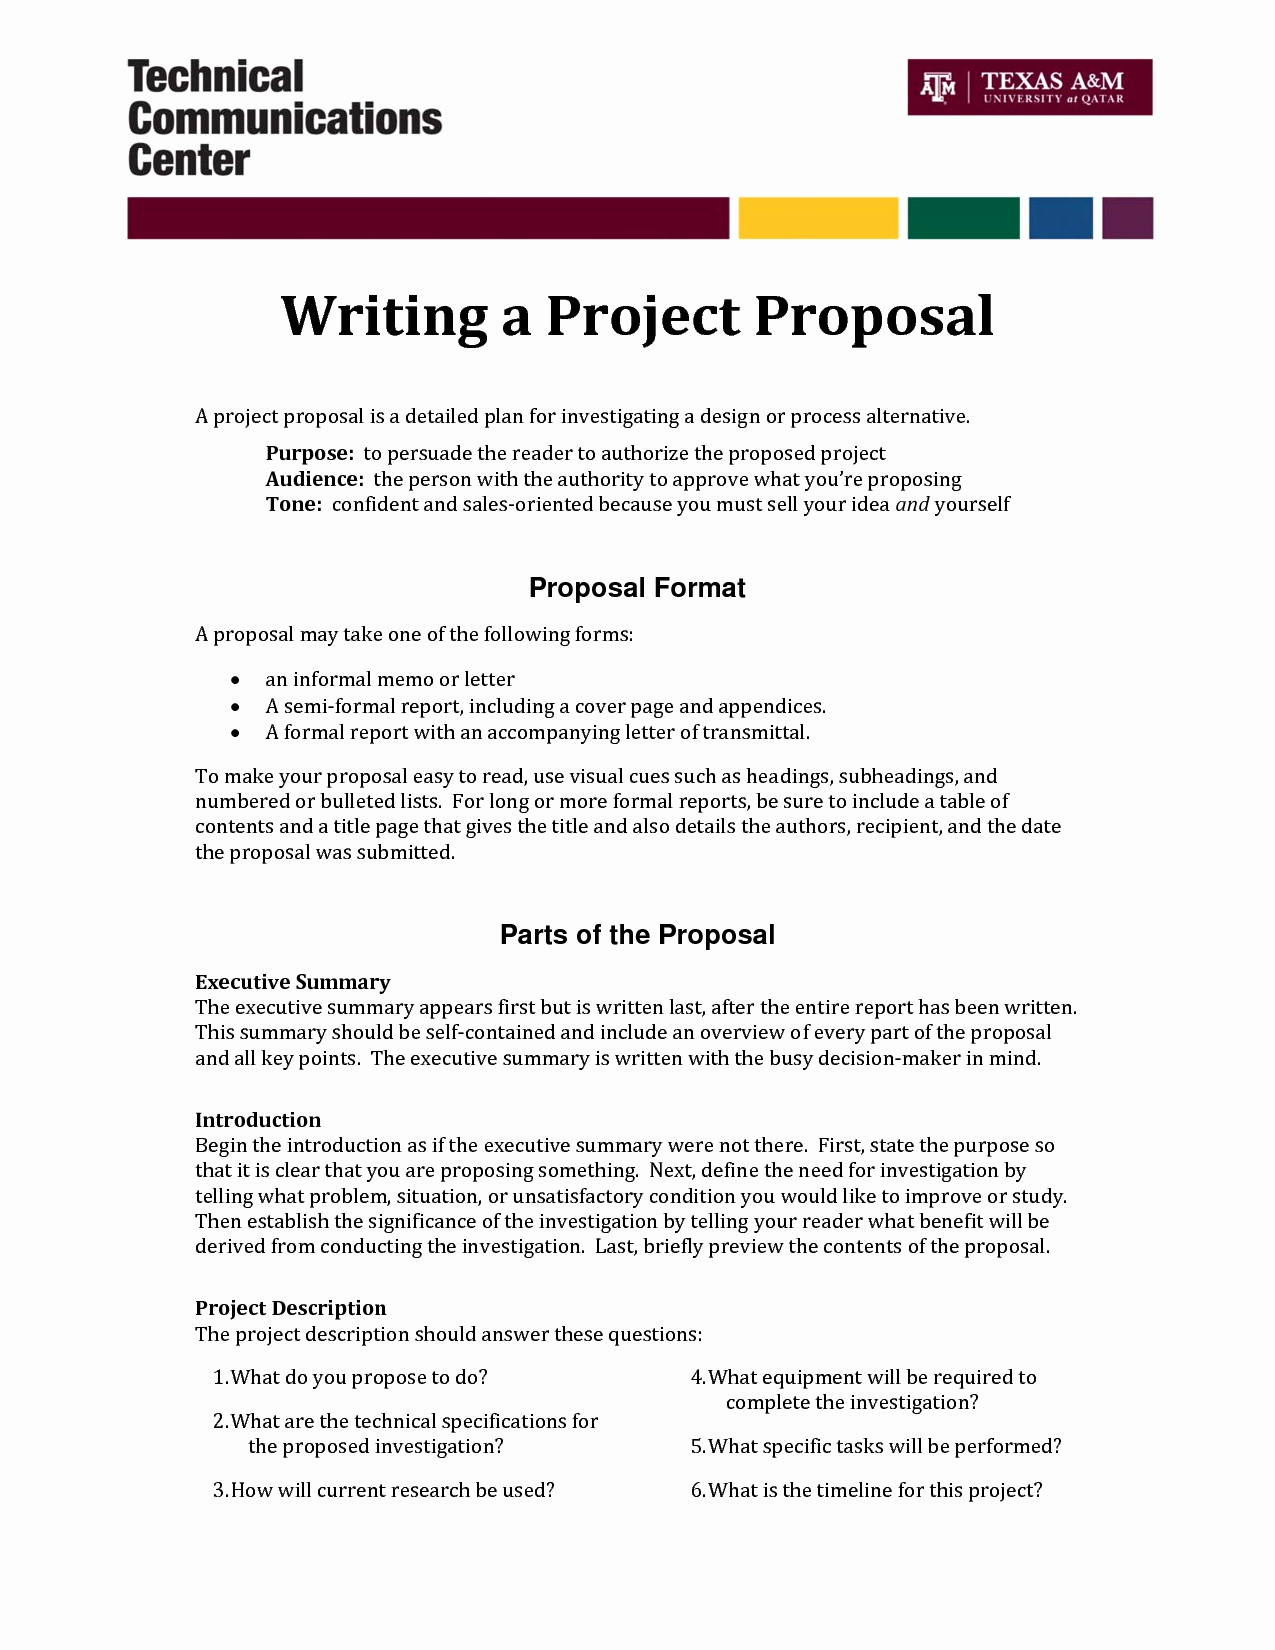 Business Analysis Proposal Template Elegant Informal Proposal Letter Regarding Business Analysis Proposal Template